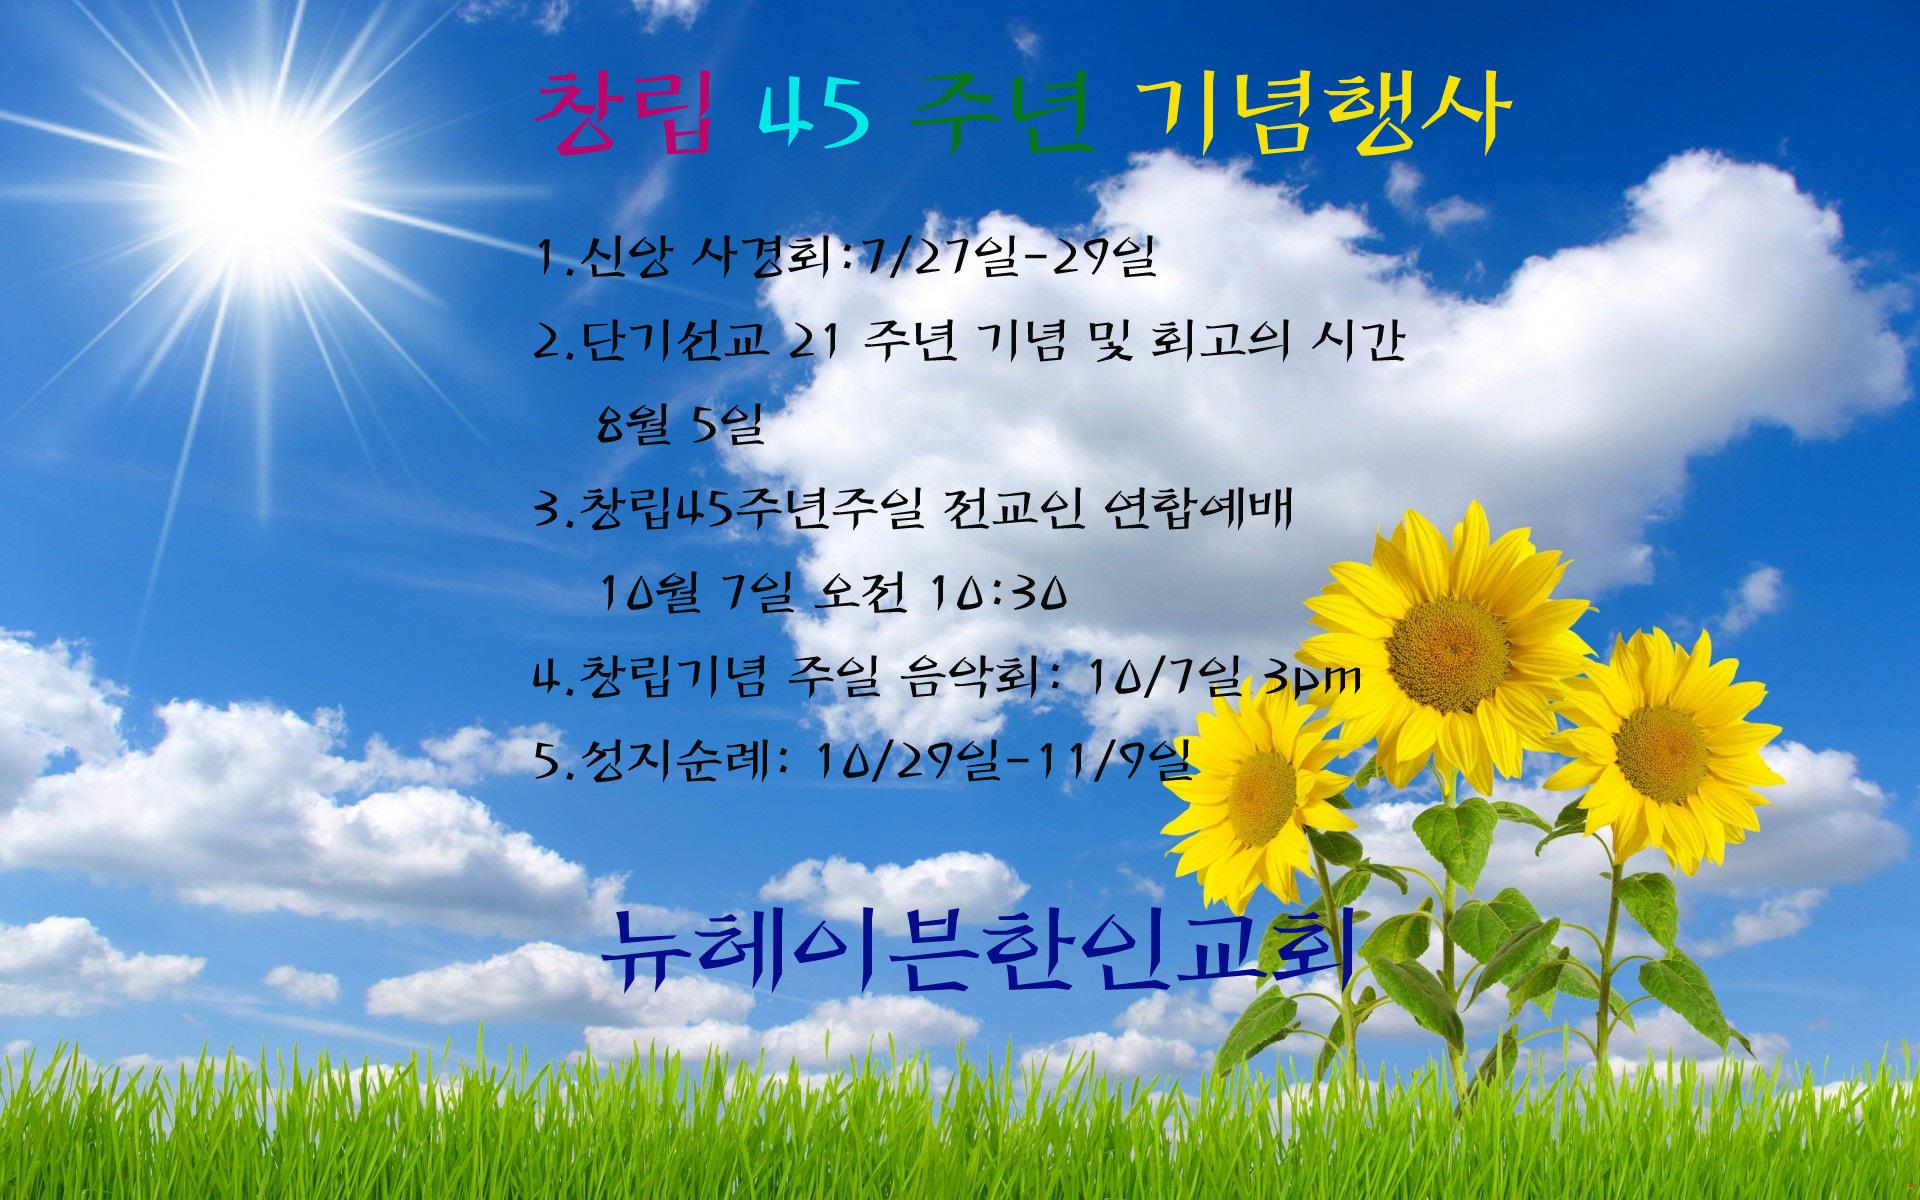 sunflower-wallpapers-wide-For-Desktop-Wallpaper.jpg